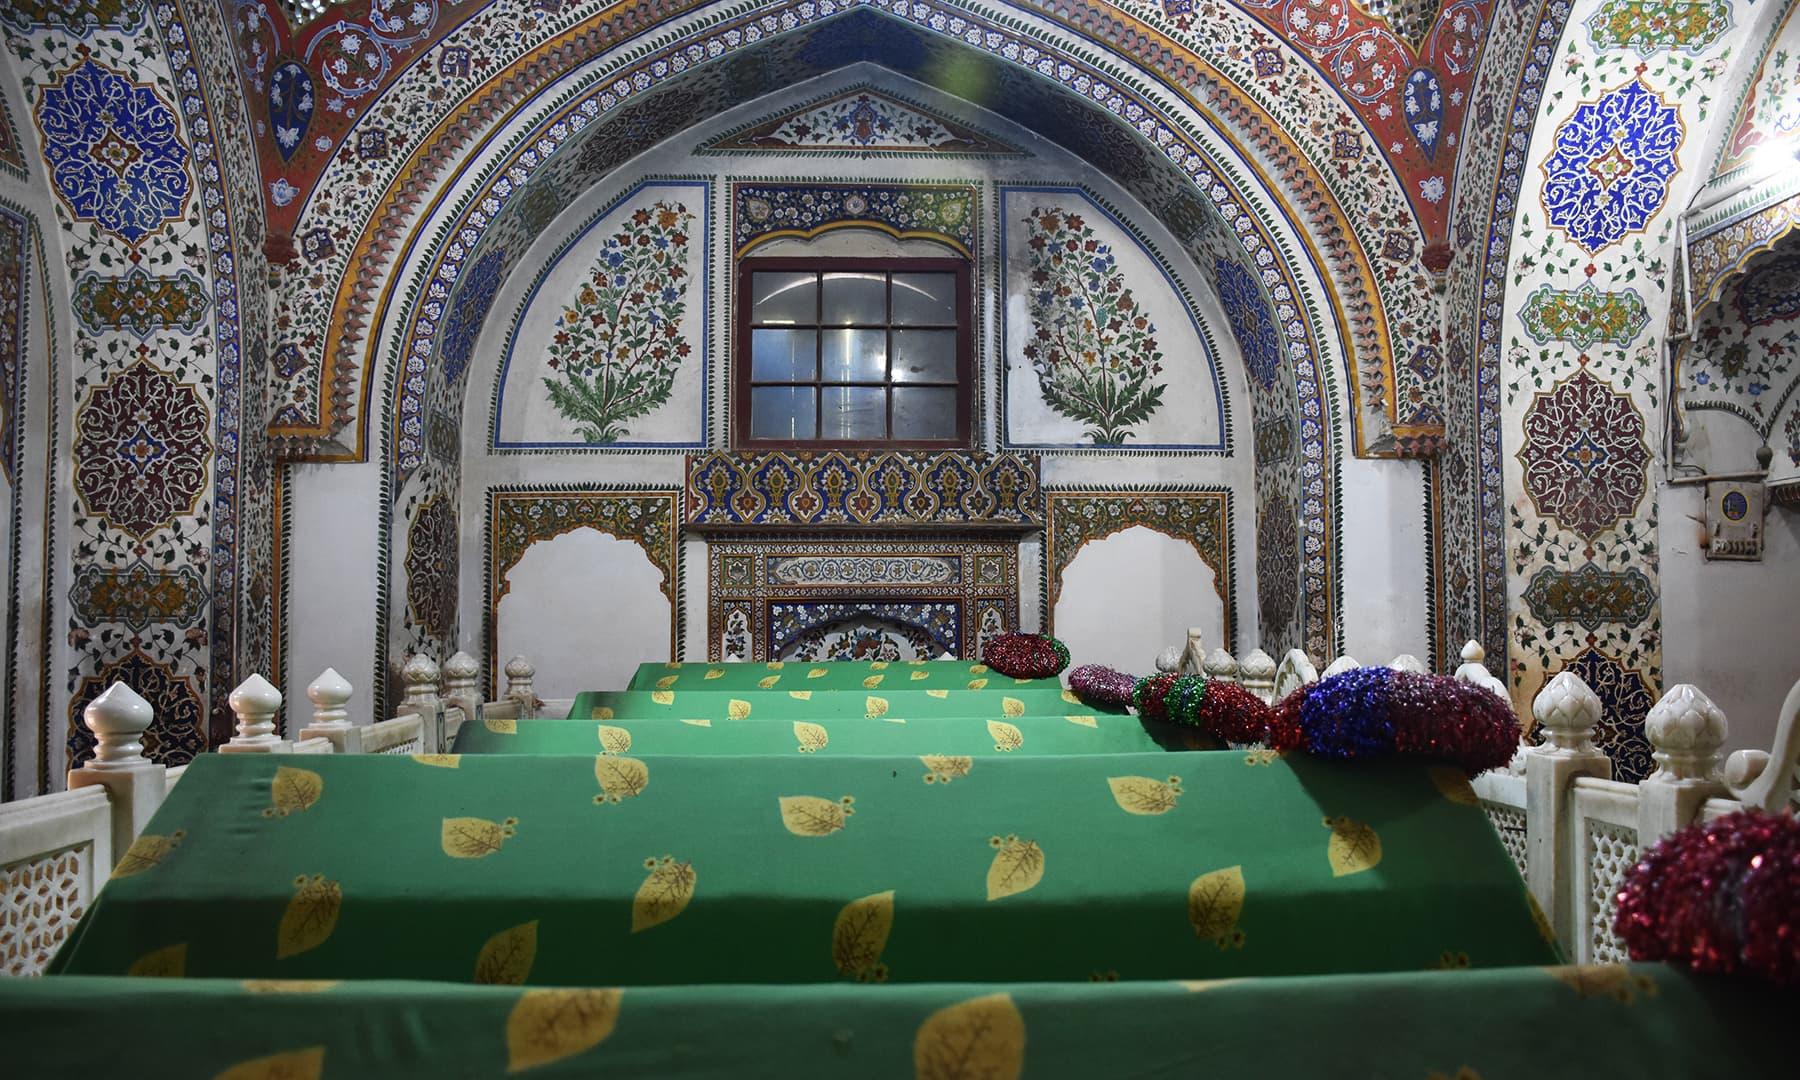 مزار کے اندر موجود دیگر قبریں—تصویر رمضان رفیق